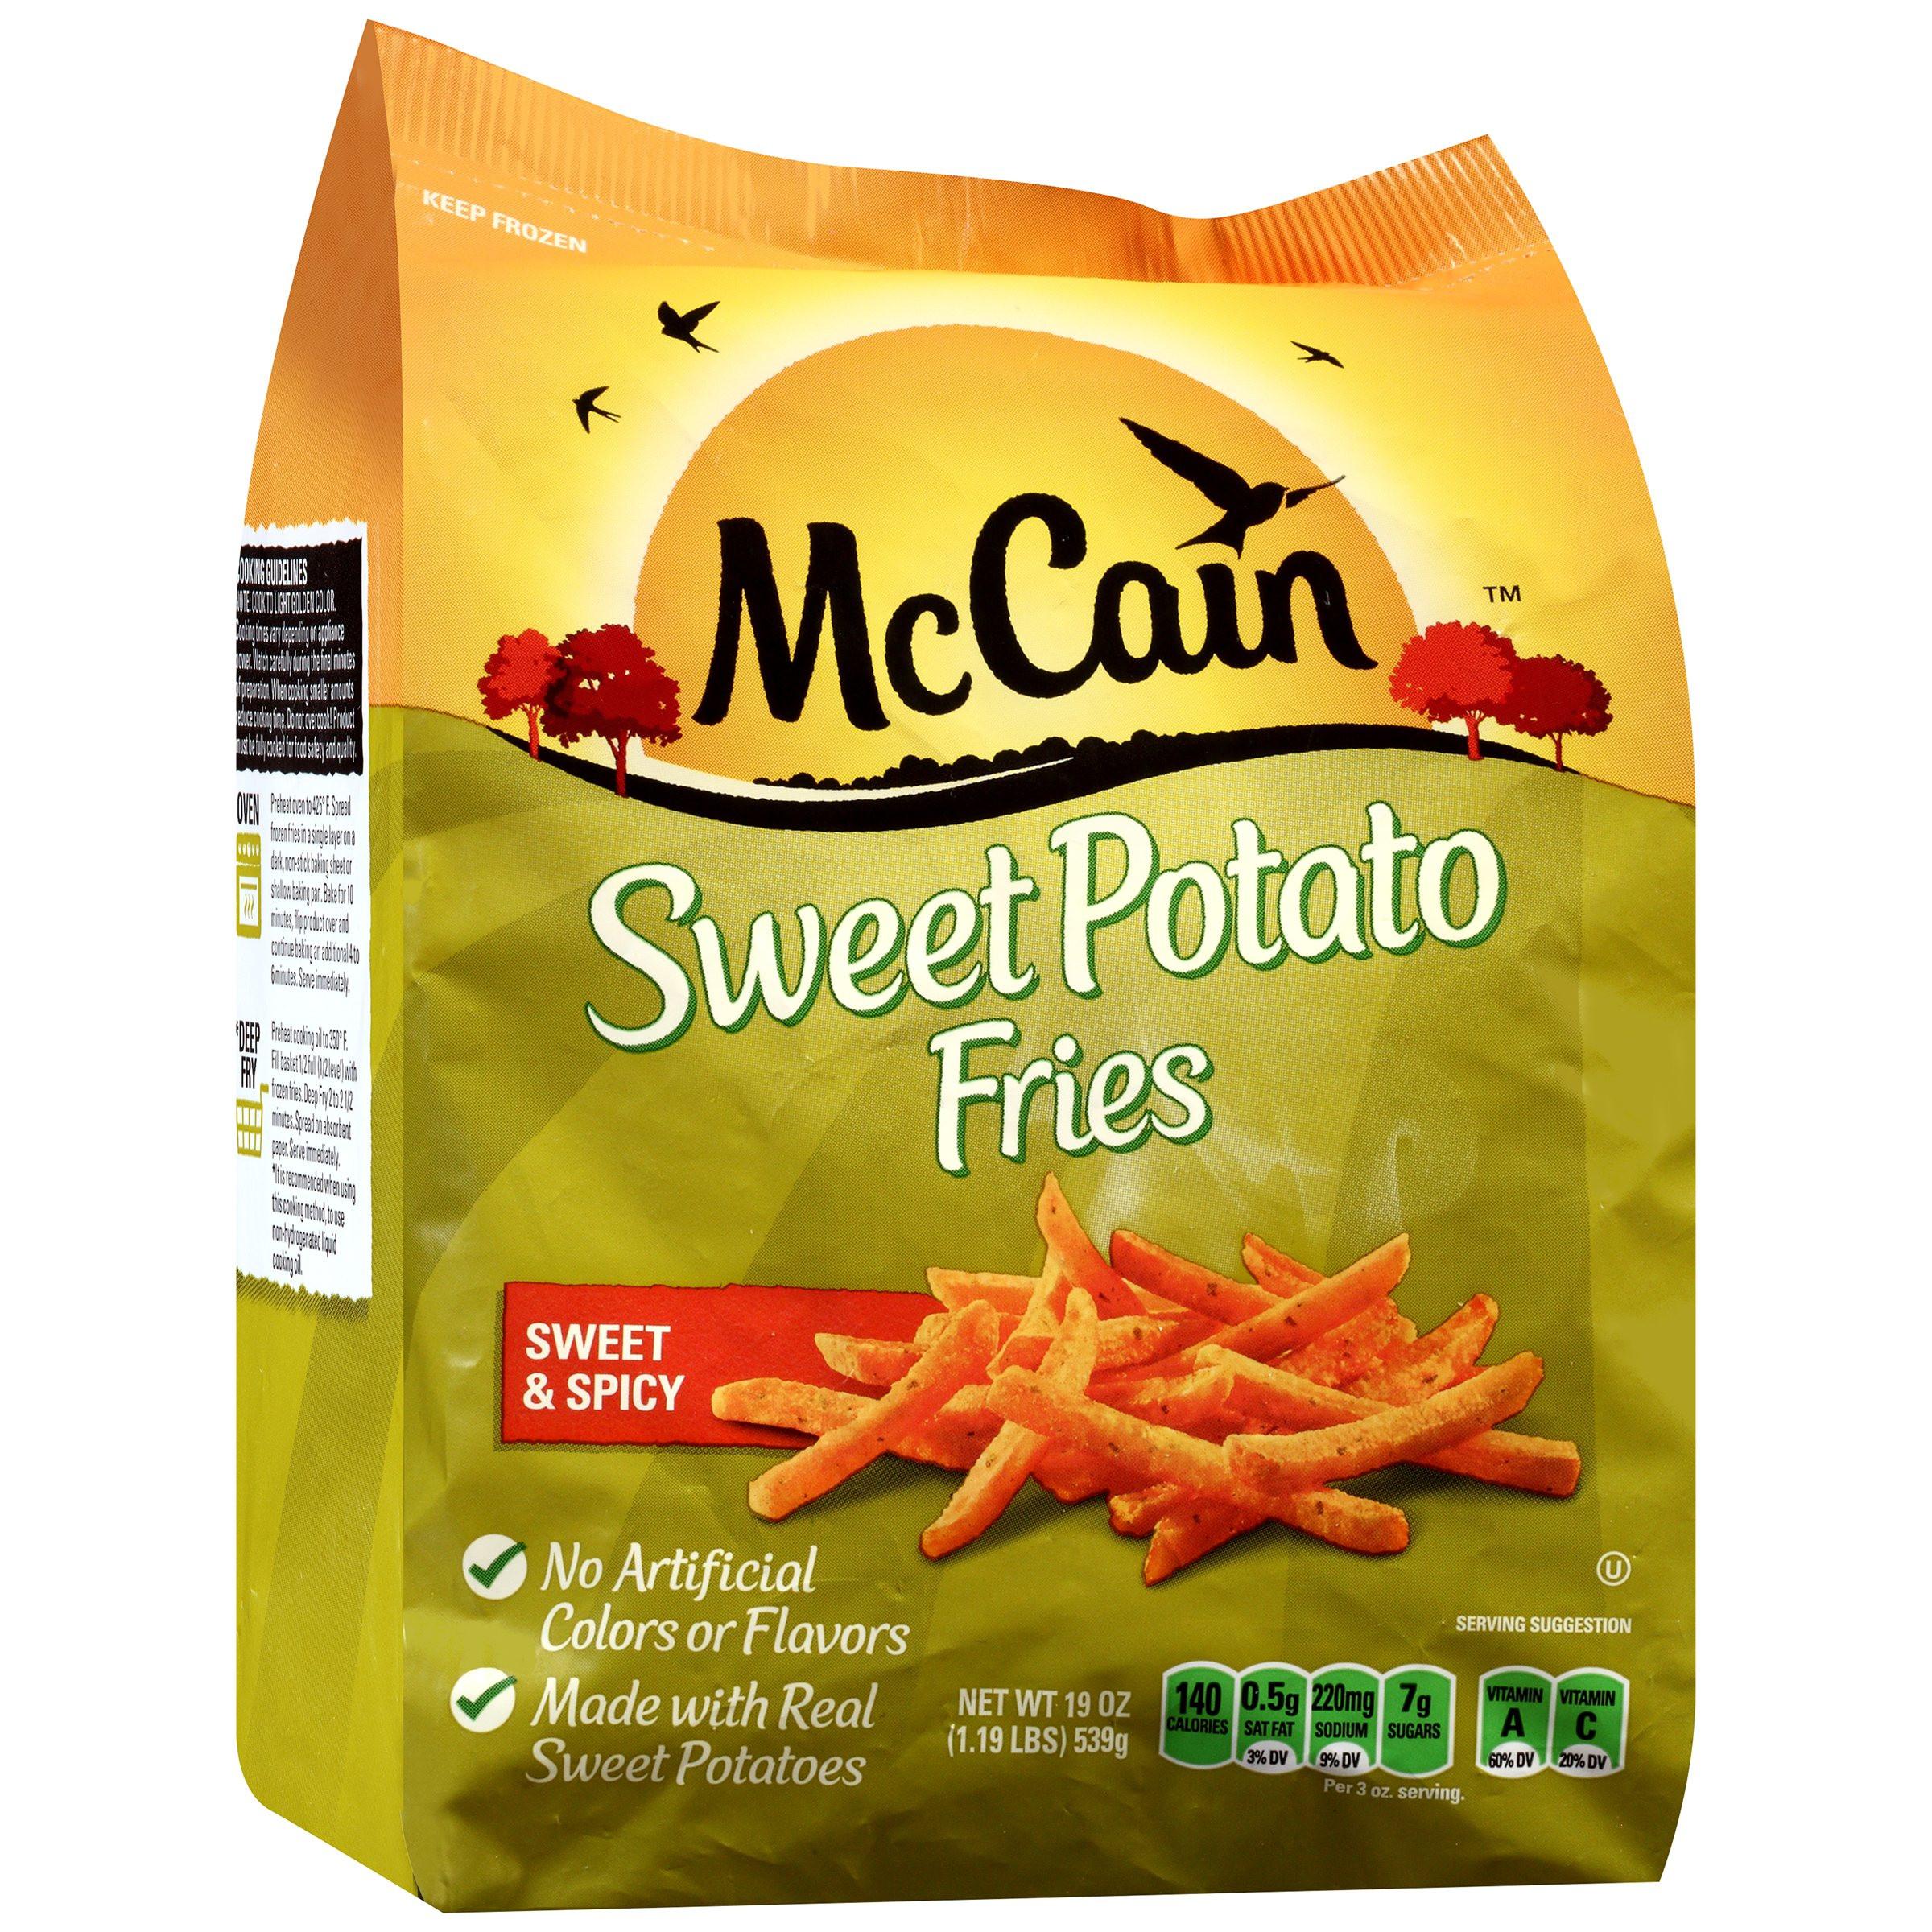 Sweet Potato Fries Calories  Mccain Sweet Potato Fries Nutritional Information